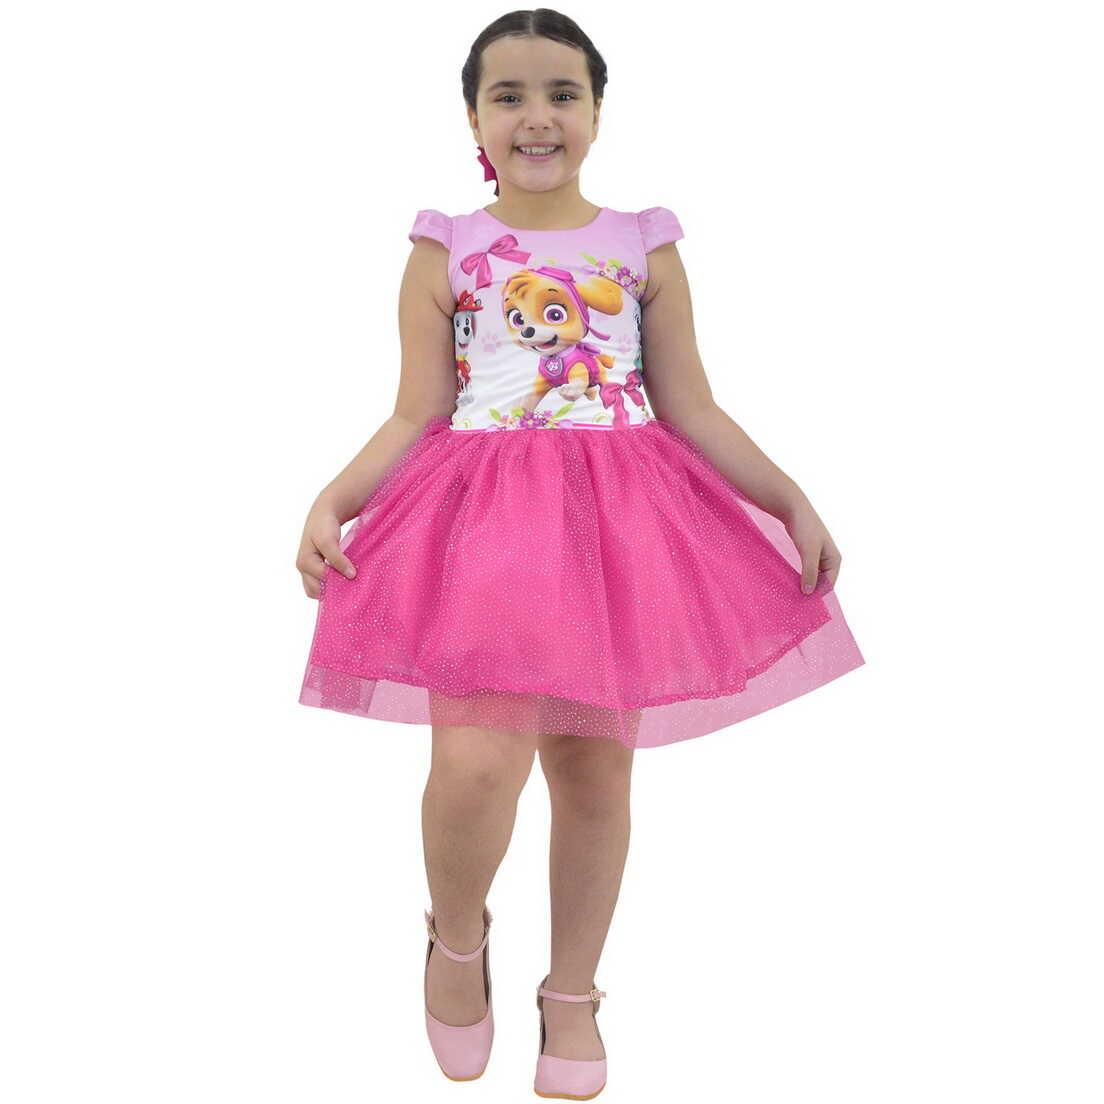 Vestido da Skye Patrulha Canina Saia Rosa de Tule Com Glitter